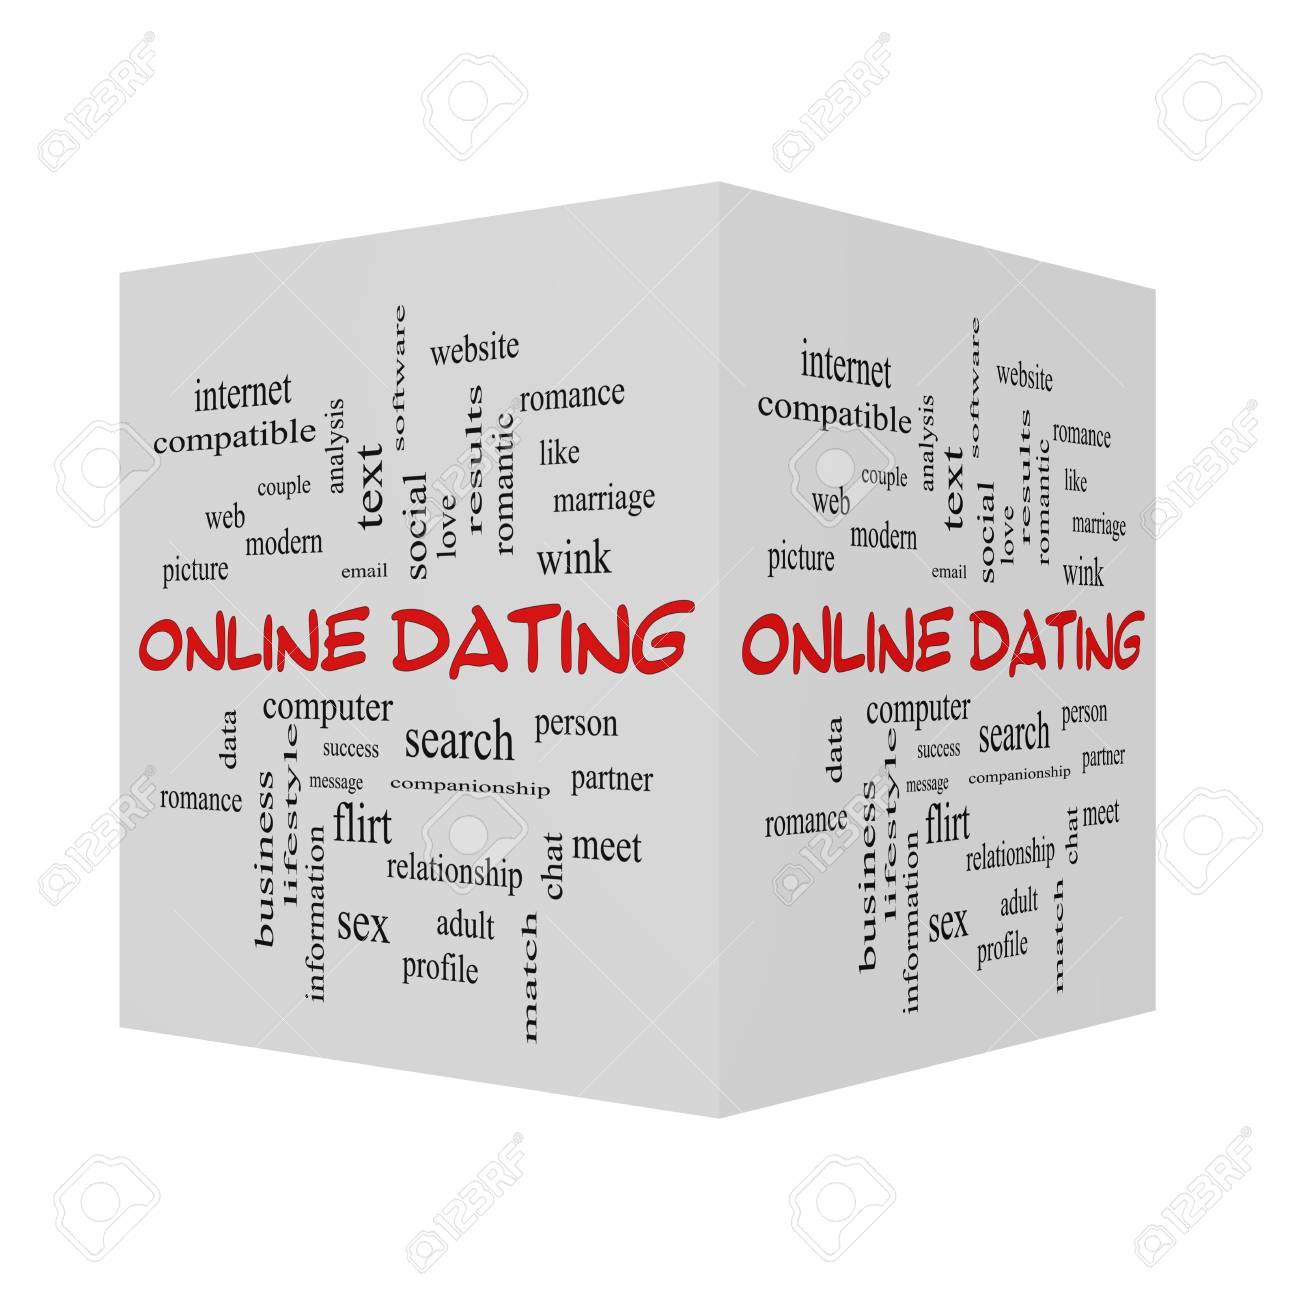 Datating Online-Ehe